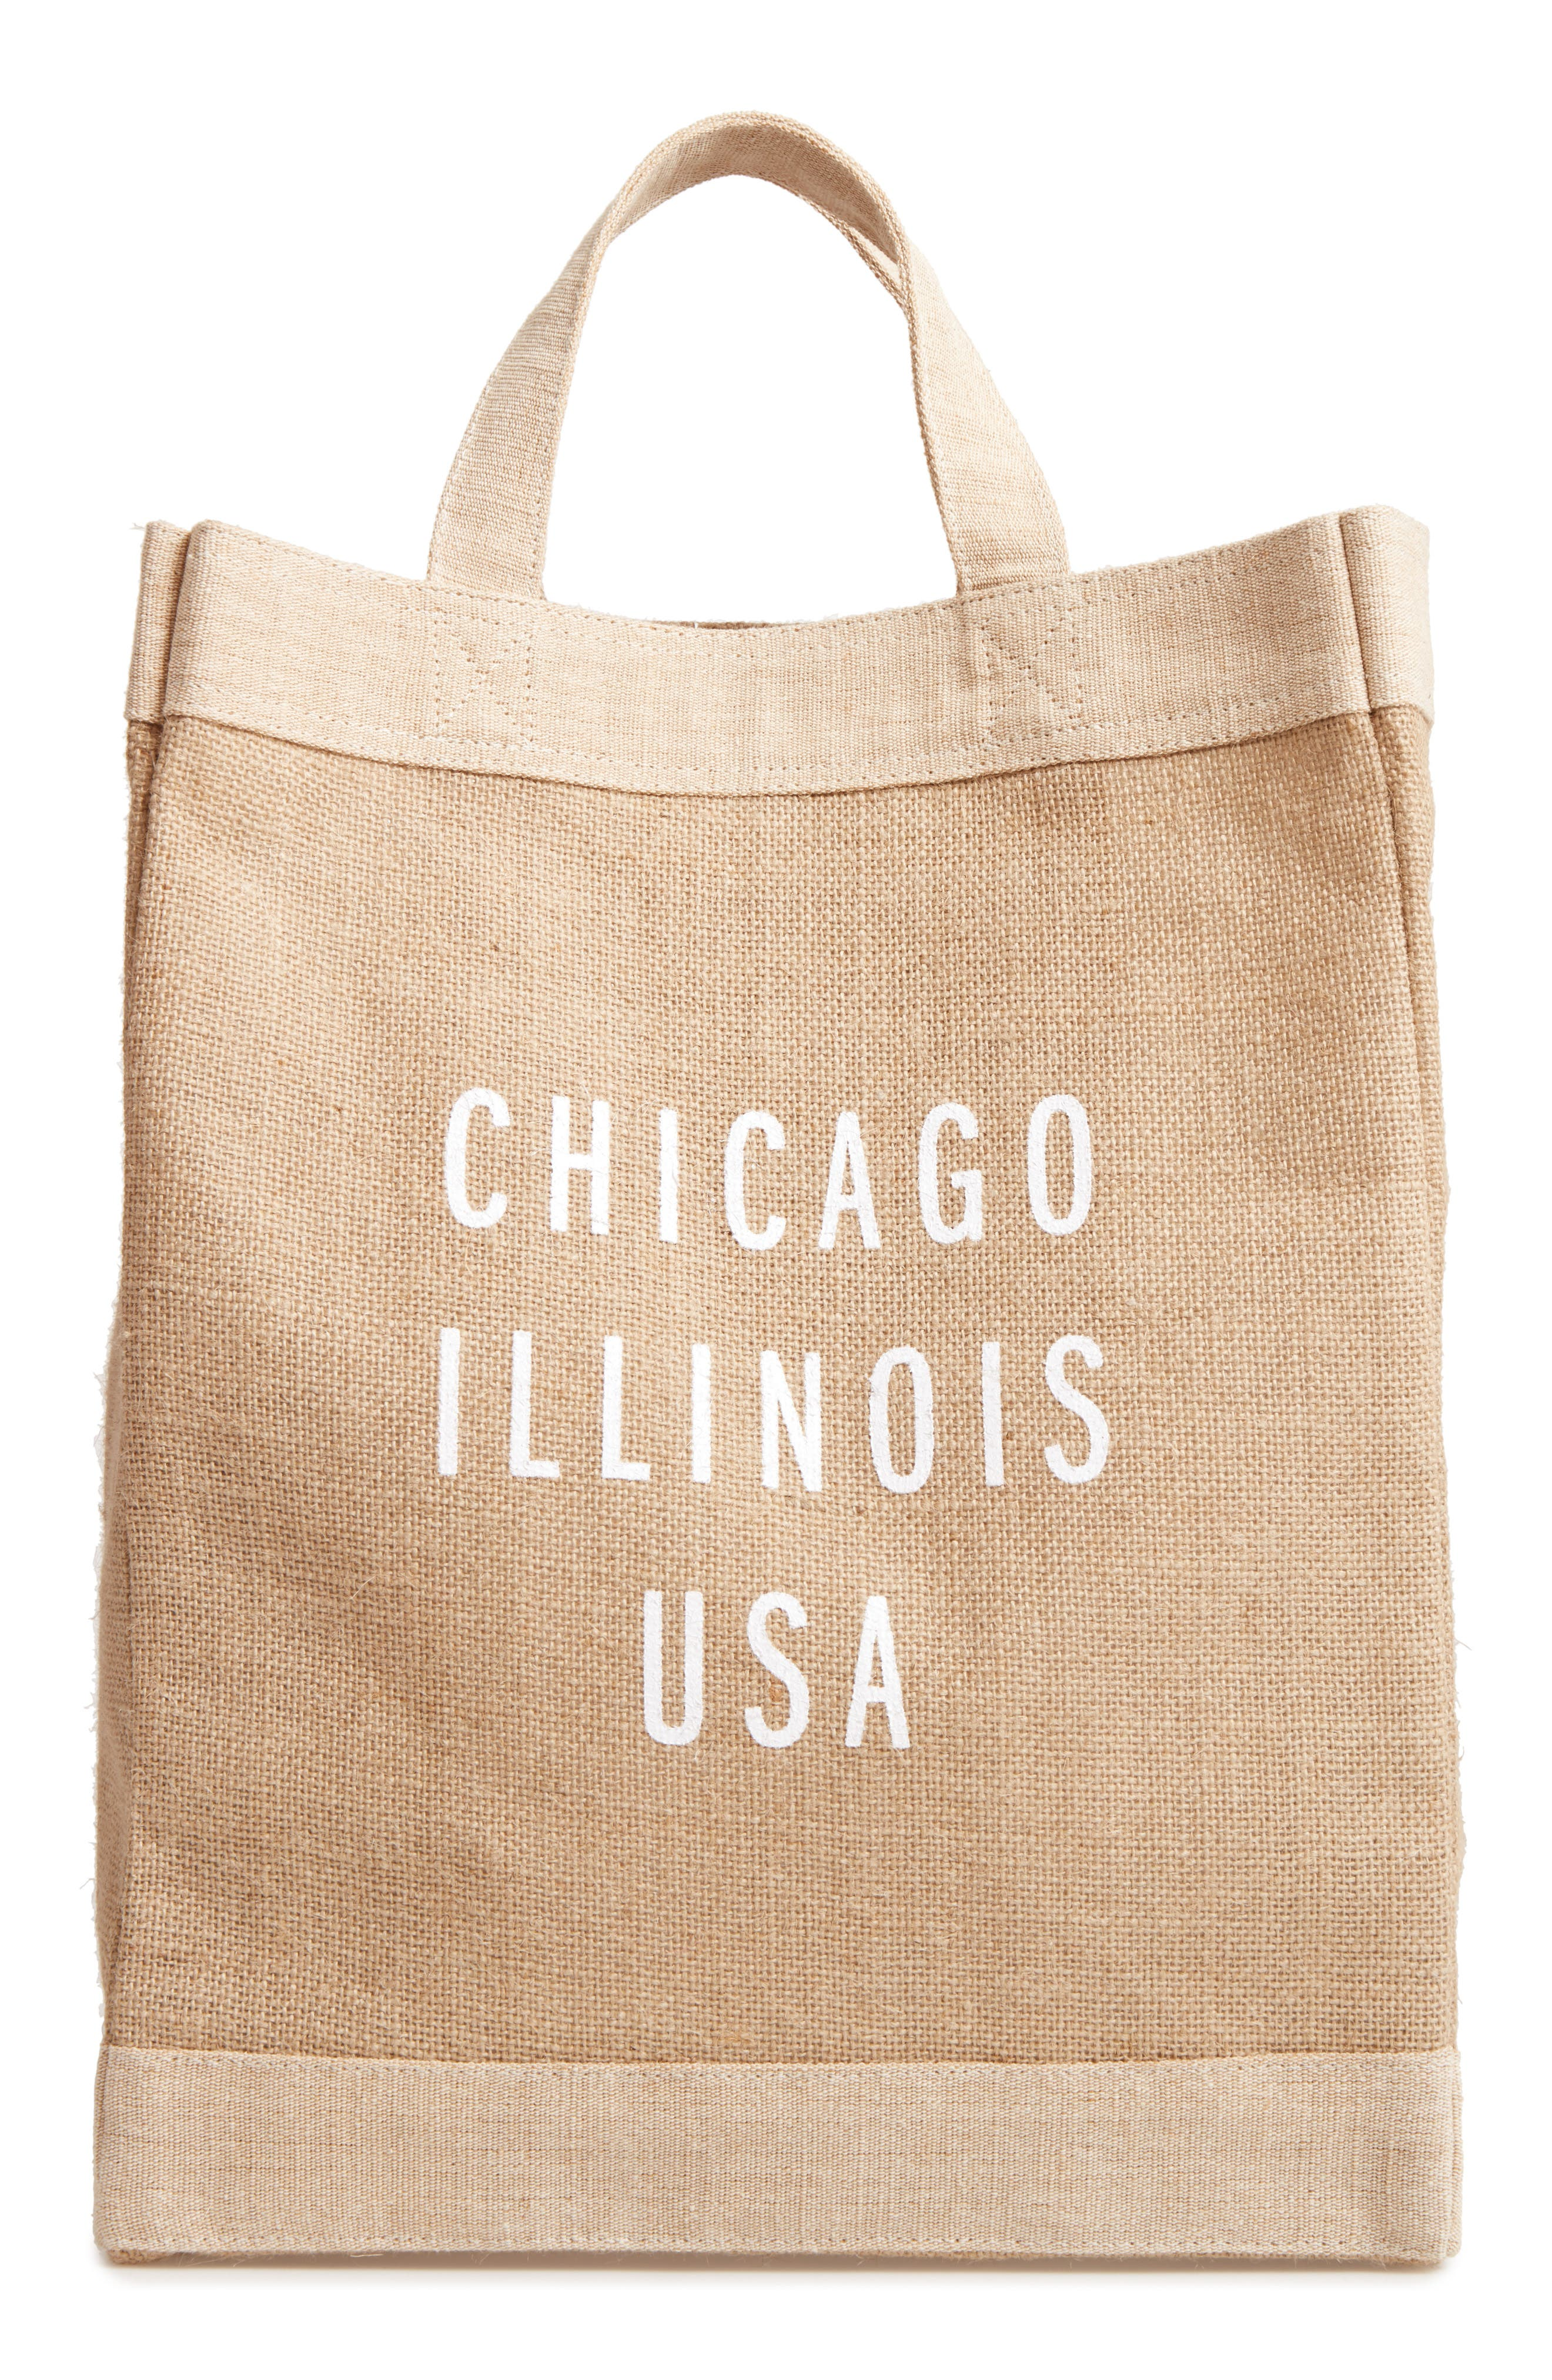 Chicago Simple Market Bag,                         Main,                         color, 200